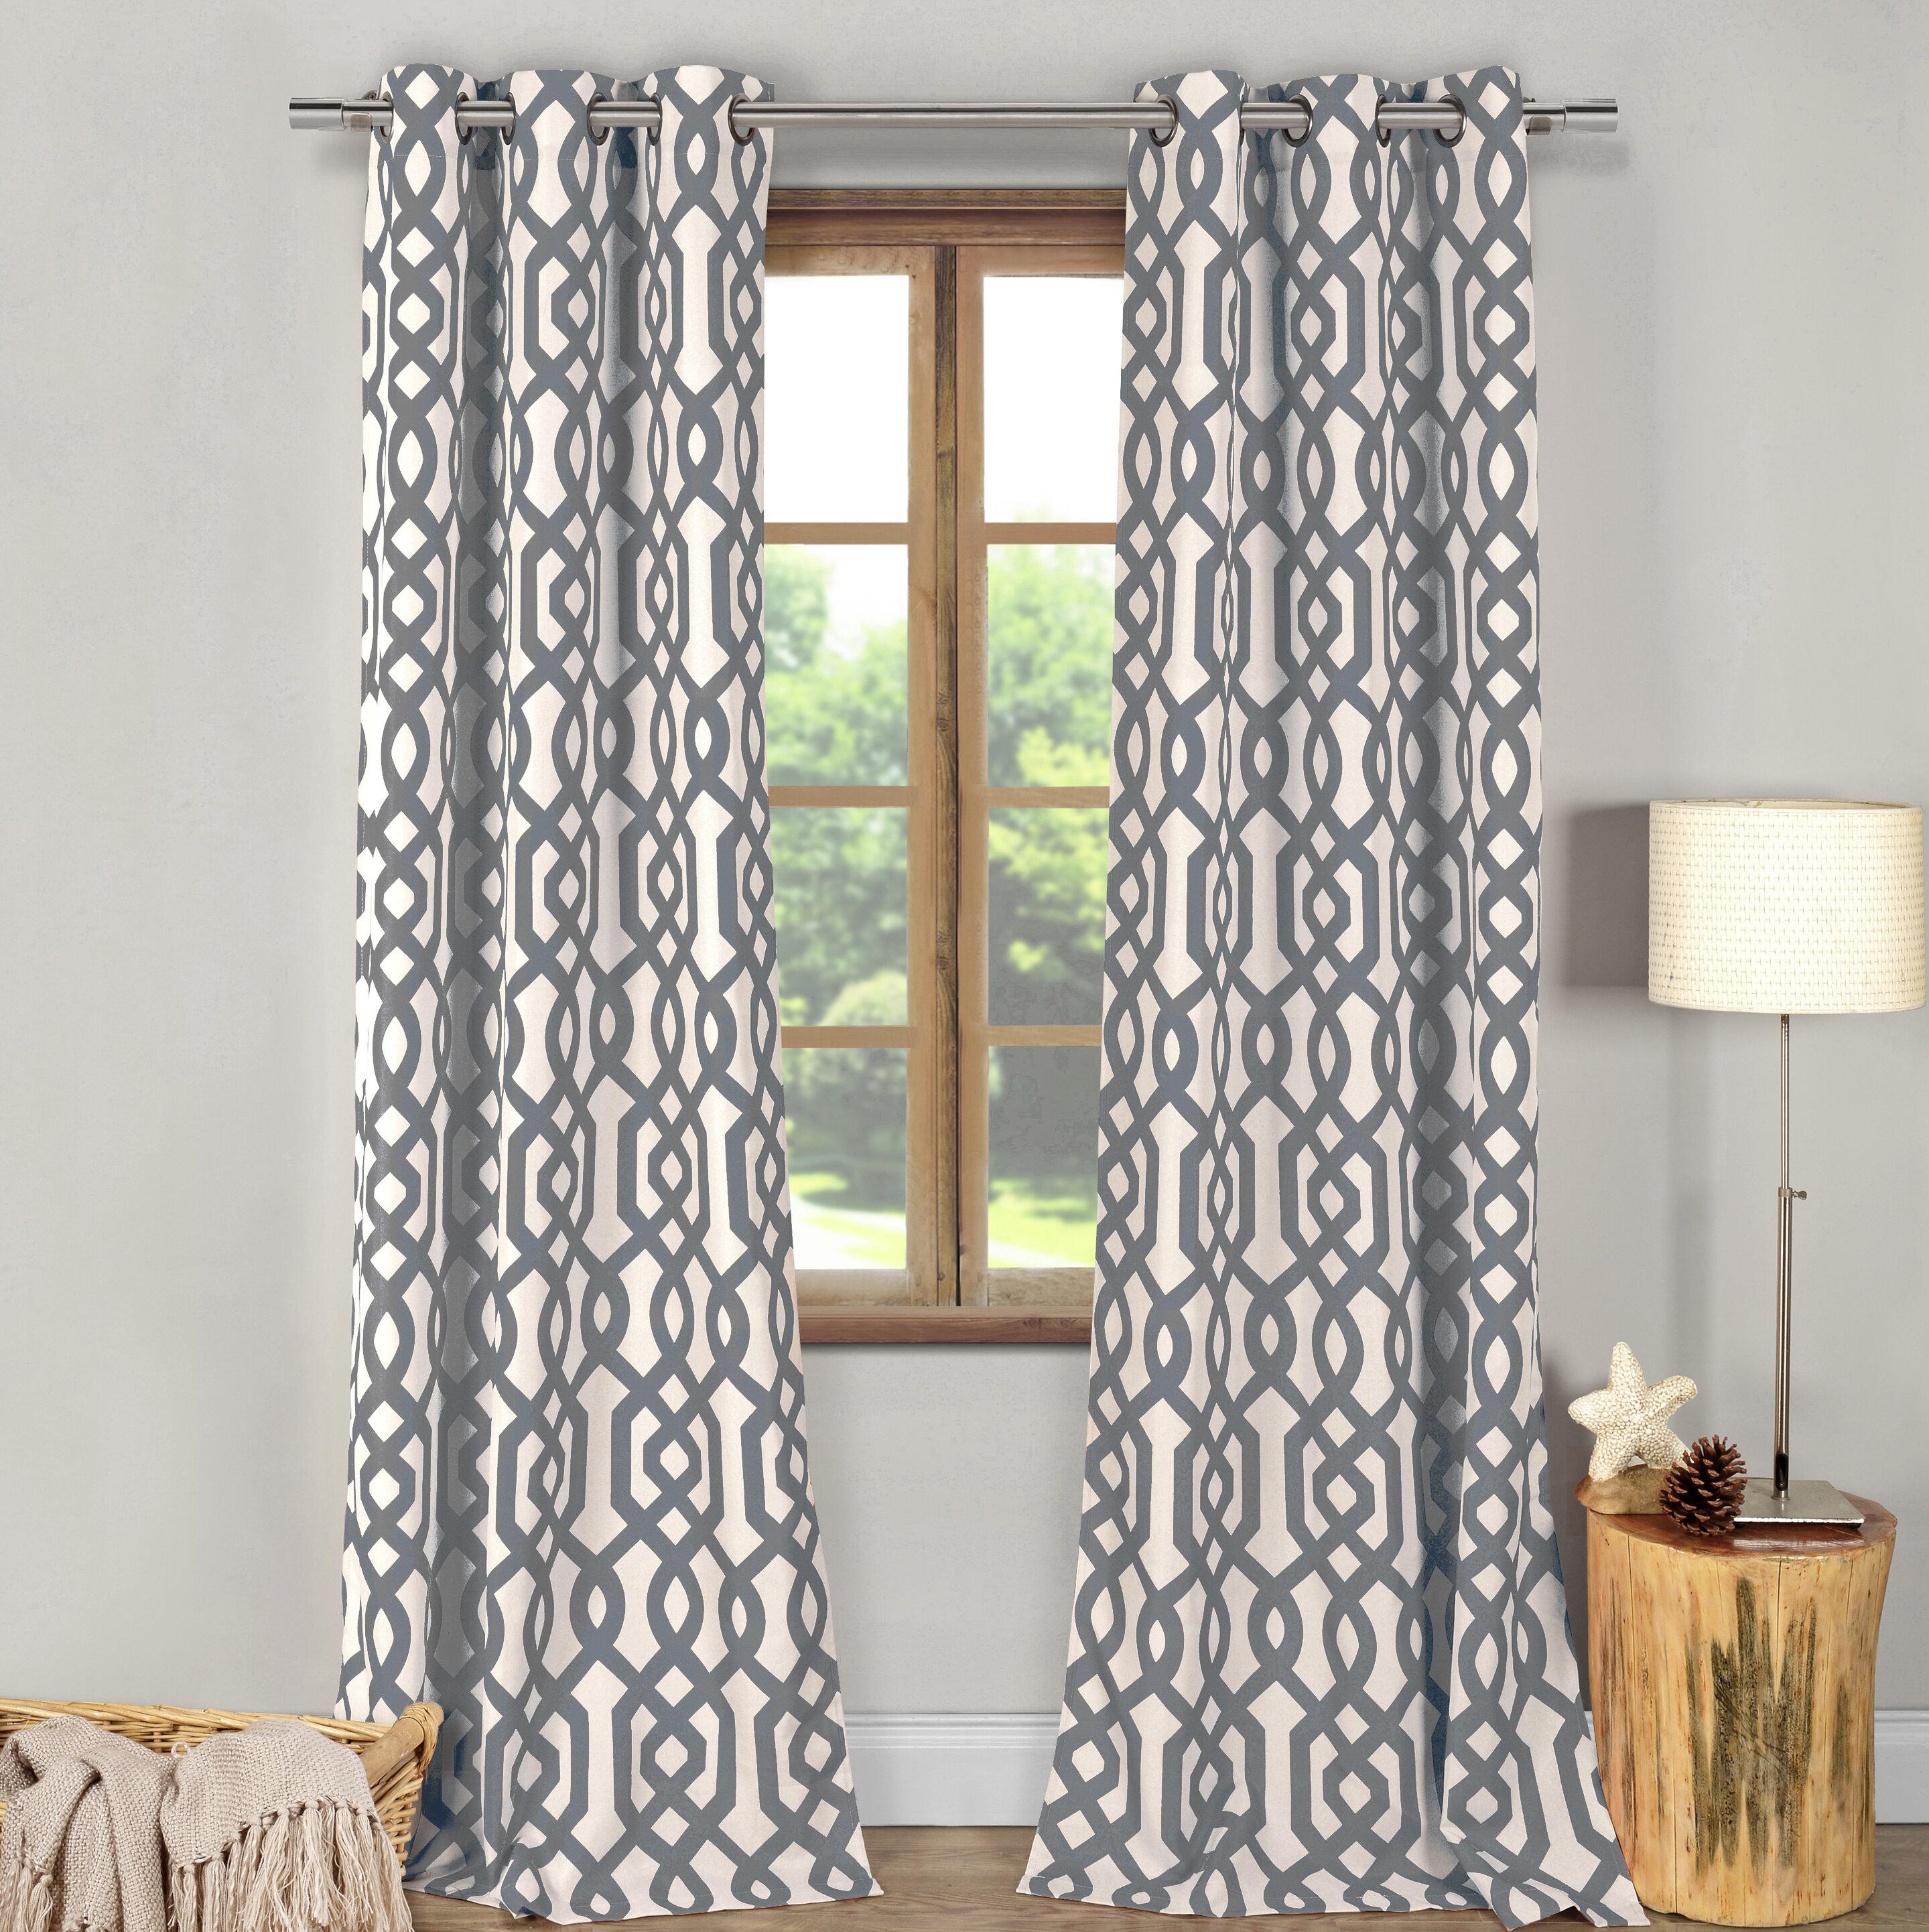 Fretwork Geometric Blackout Grommet Curtain Panels In Fretwork Print Pattern Single Curtain Panels (View 9 of 20)